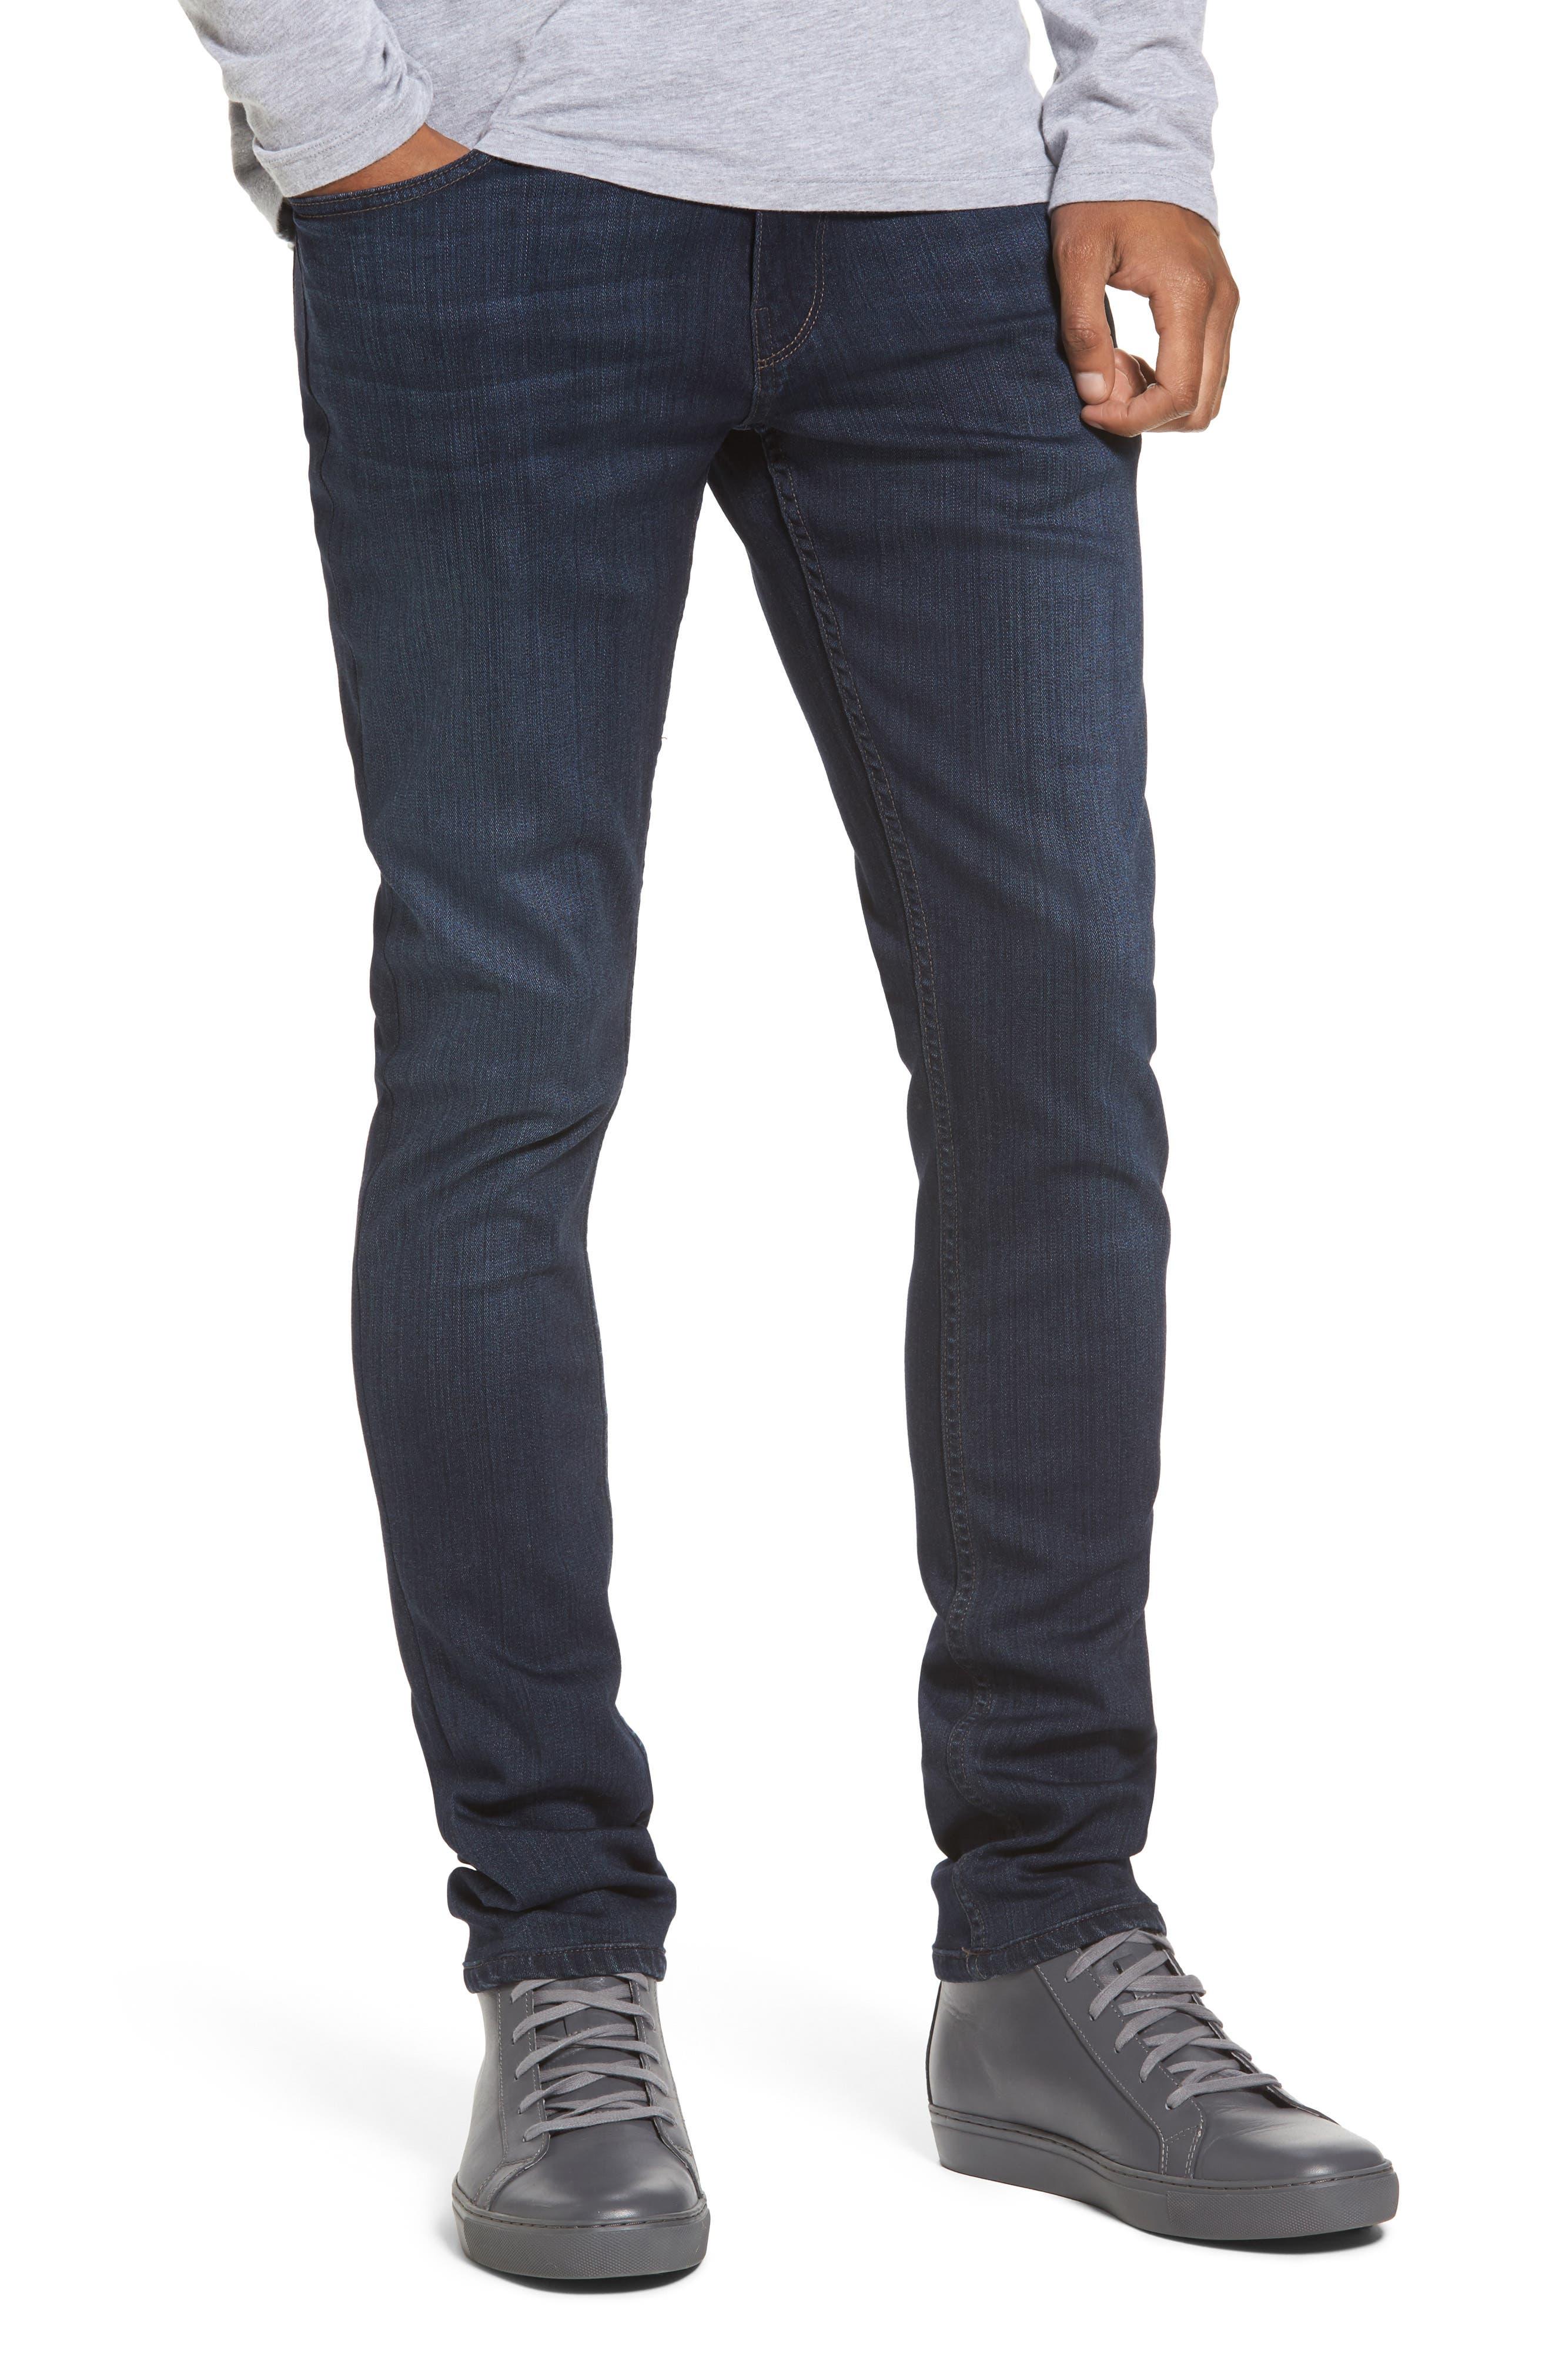 Transcend - Croft Skinny Fit Jeans,                             Main thumbnail 1, color,                             Barron